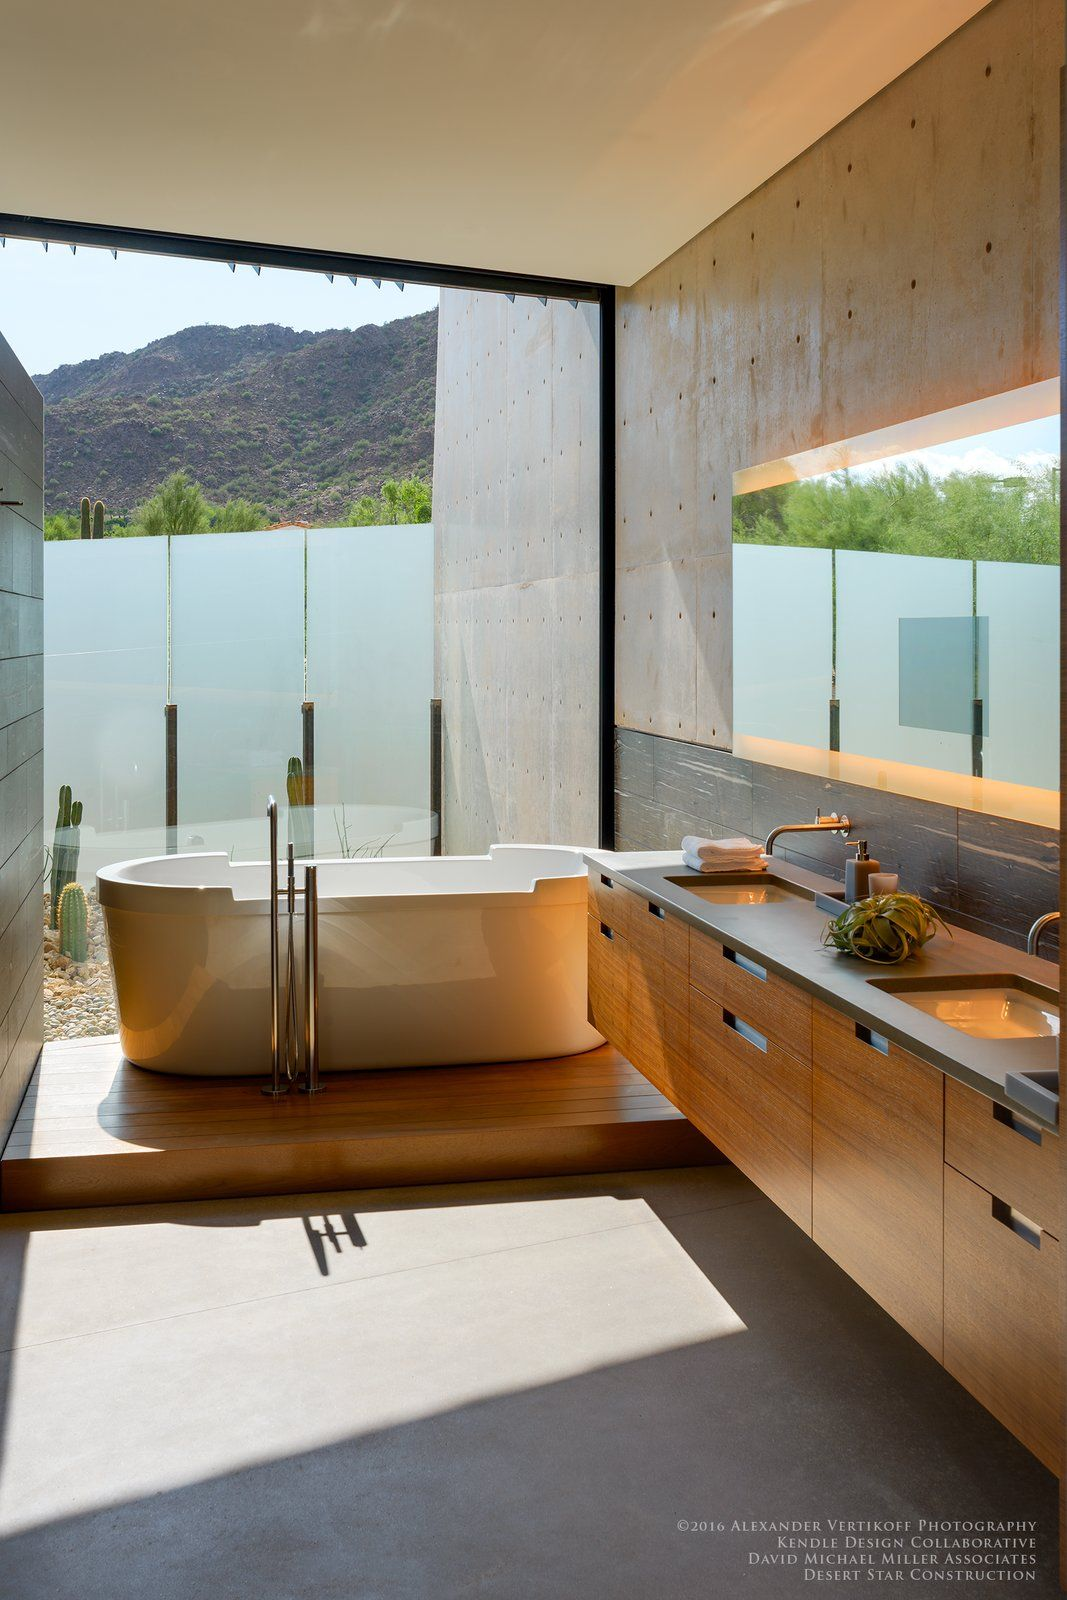 Modern Home With Bath Room Concrete Floor Concrete Counter Freestanding Tub Undermo Top Bathroom Design Interior Design Styles Contemporary Interior Design